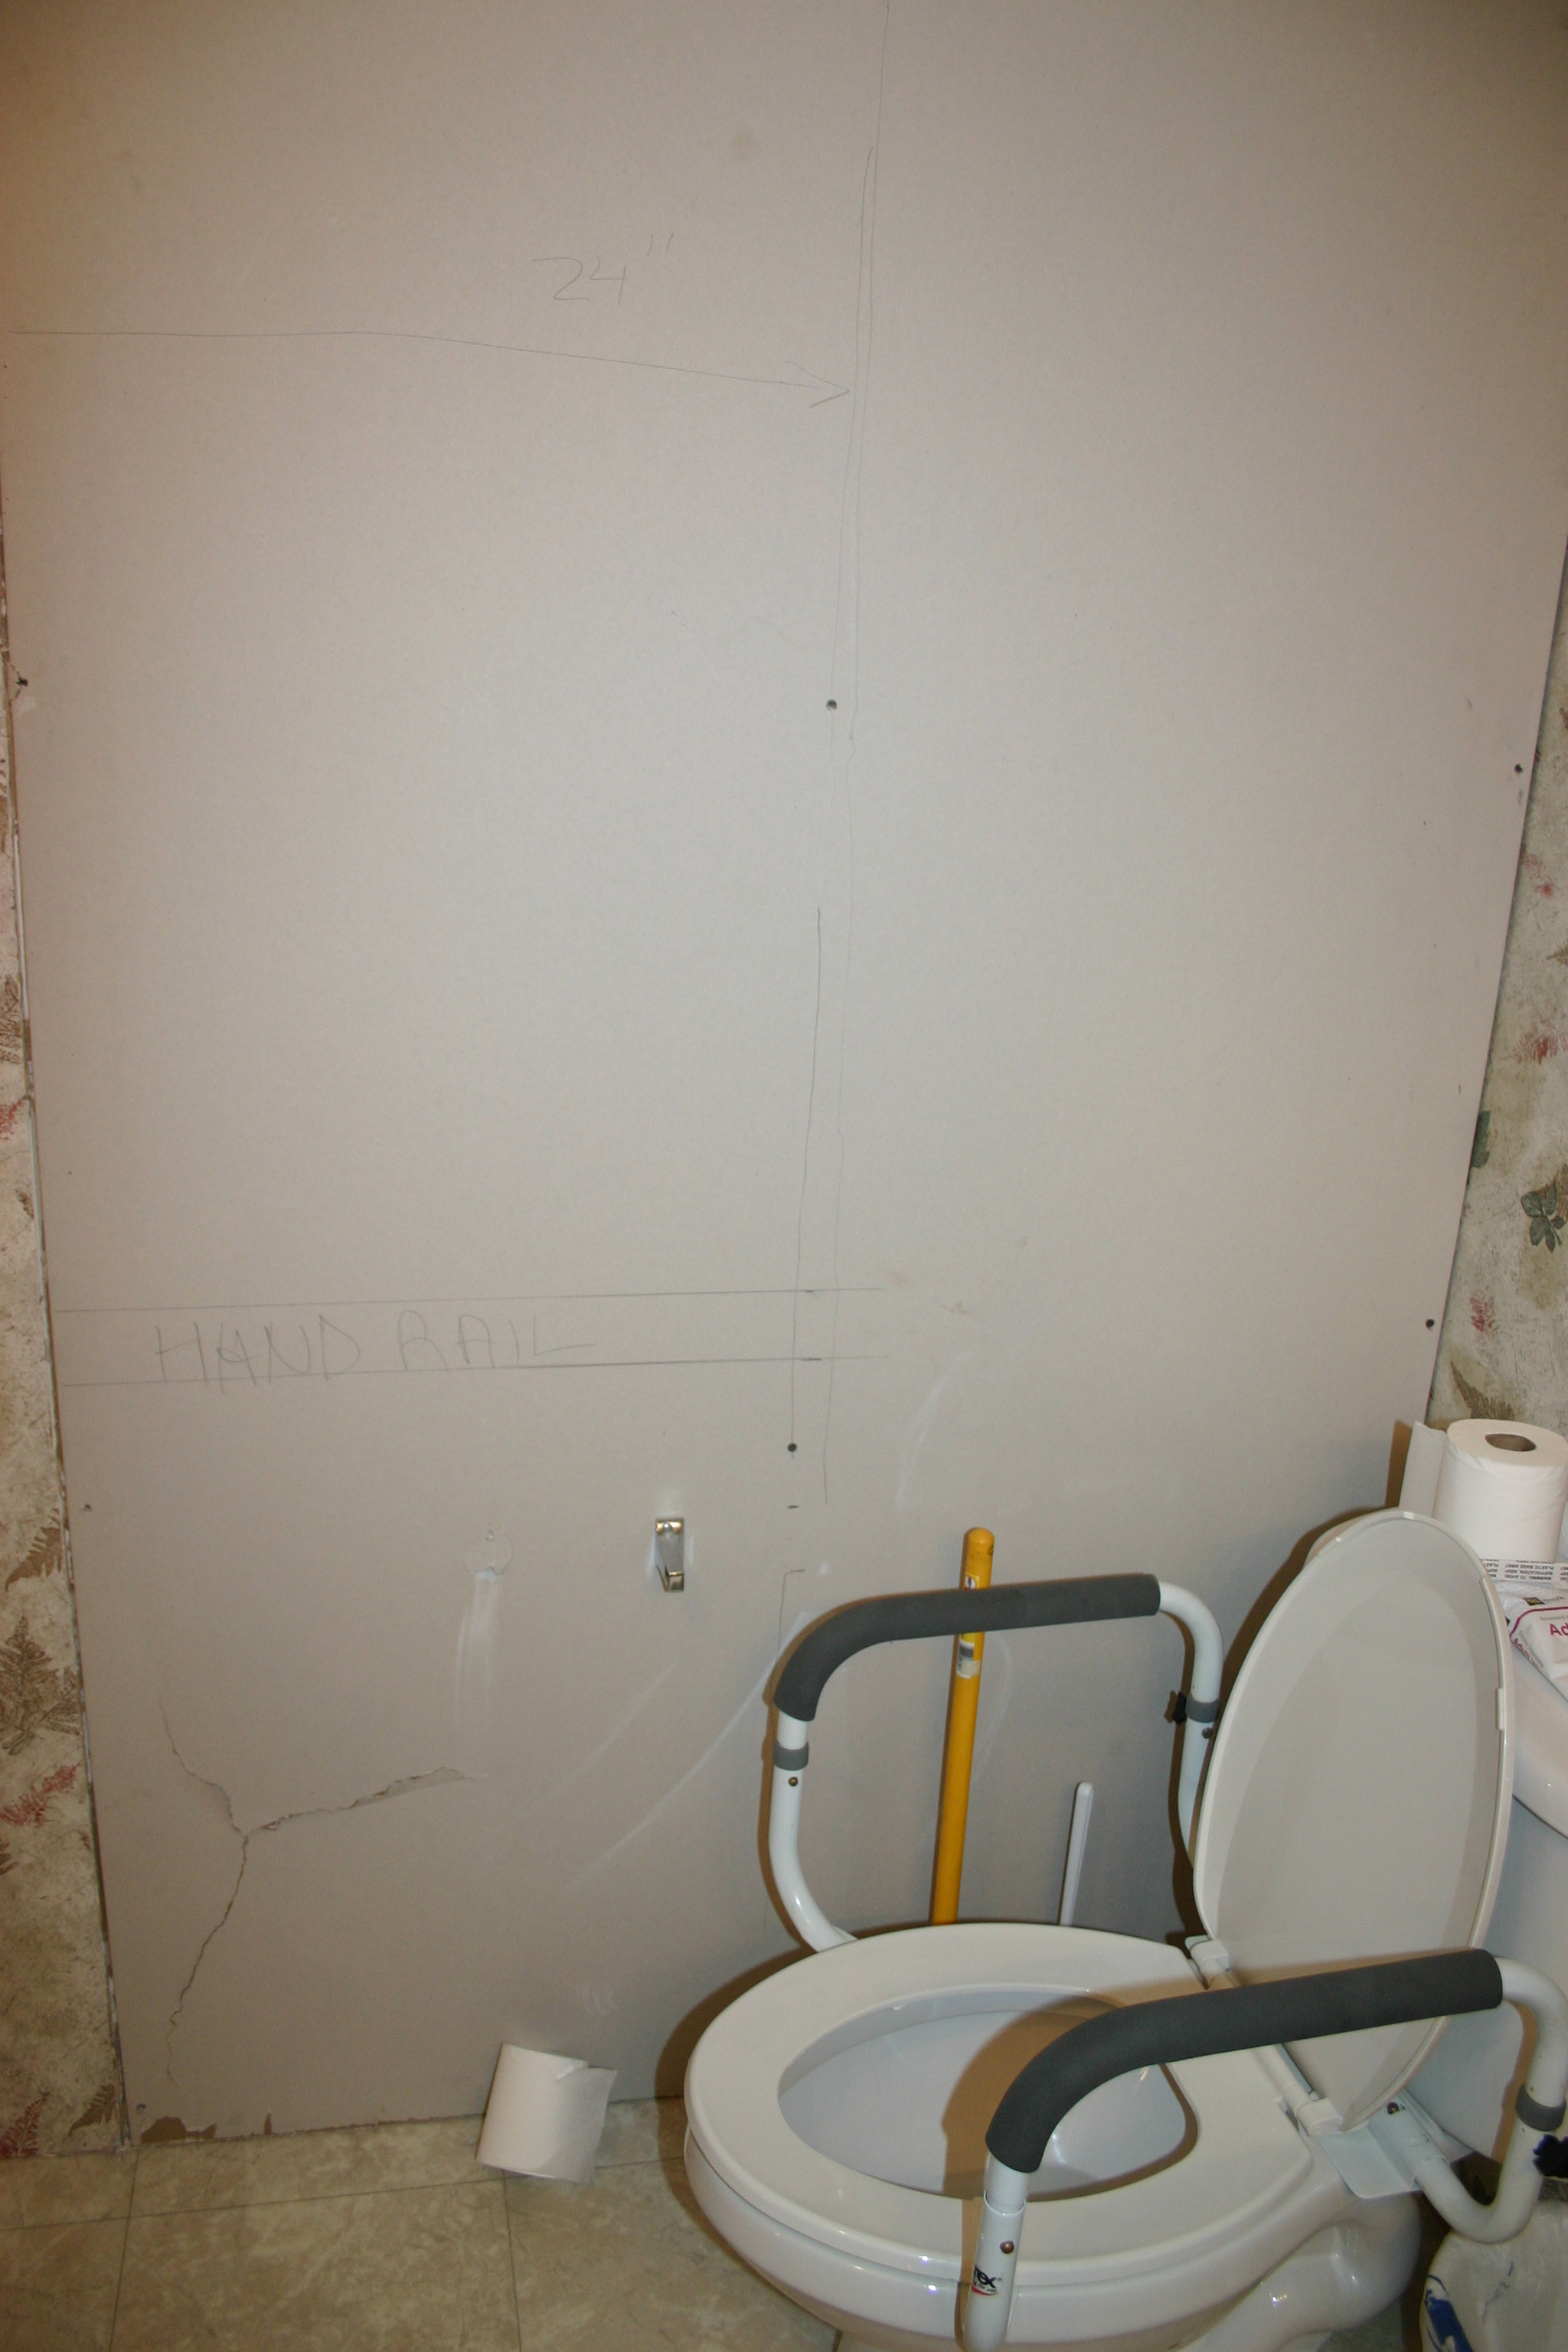 annie green bathroom wall...not on list